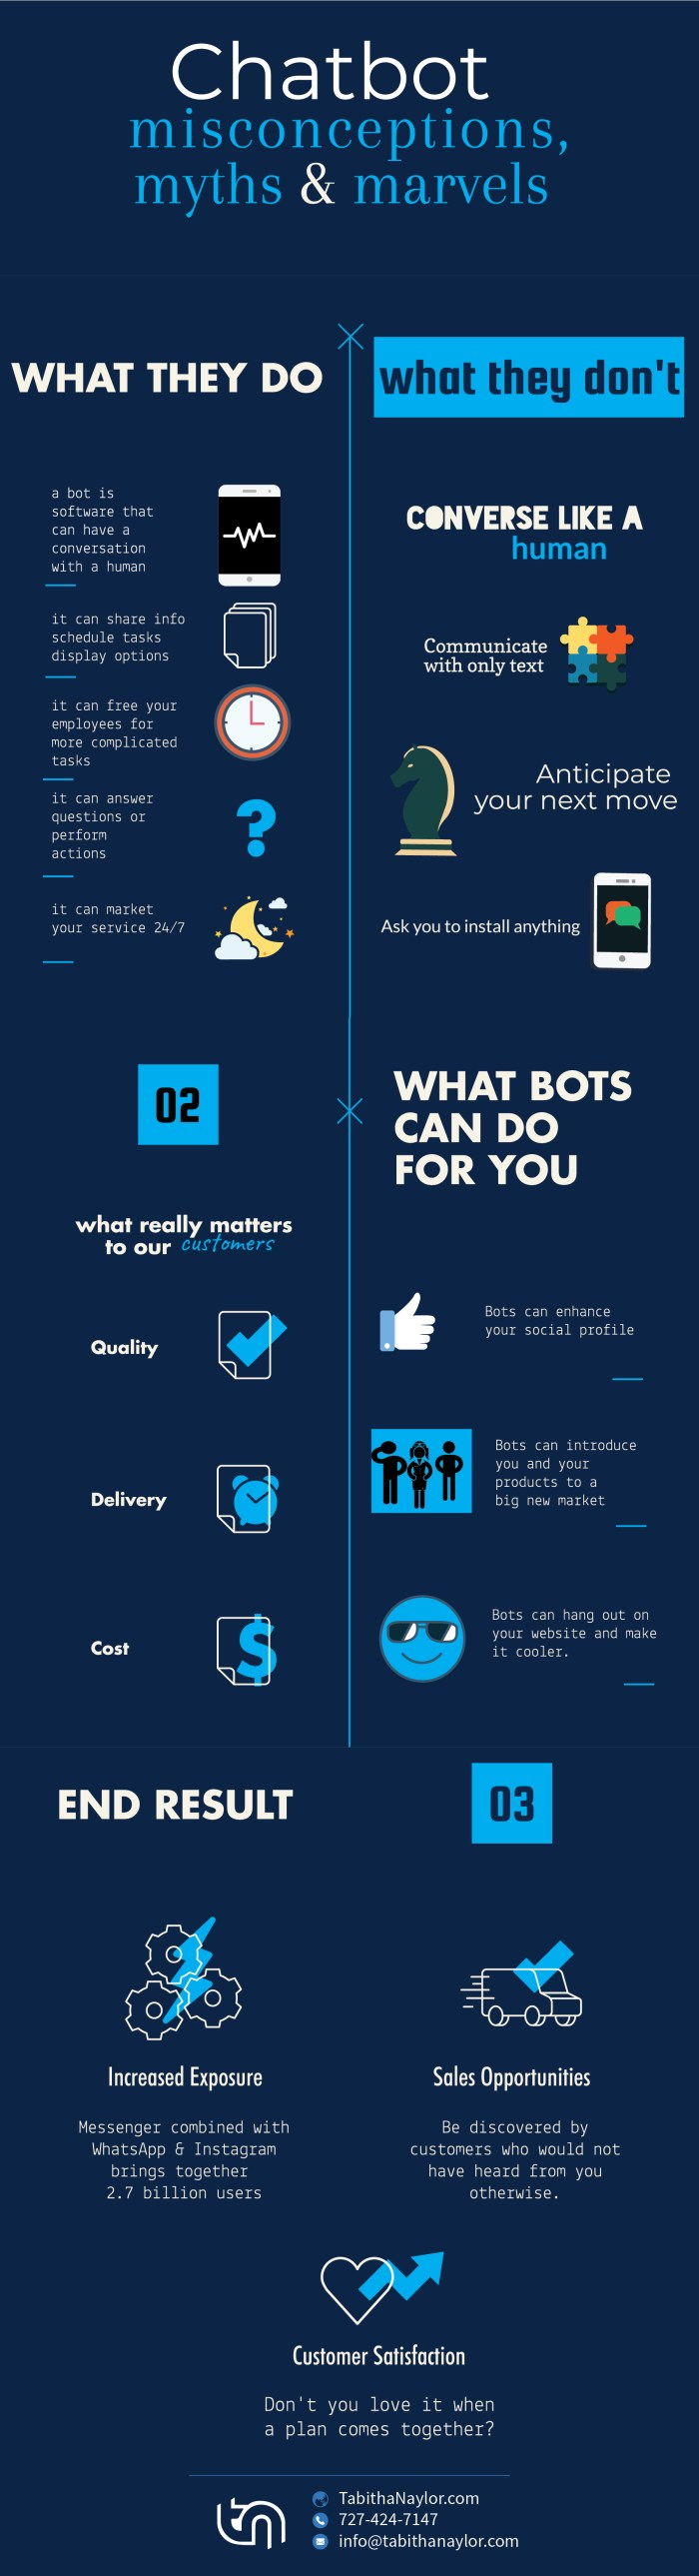 What-is-a-Facebook-Messenger-Marketing-Bot-3_2_Rebranded-01